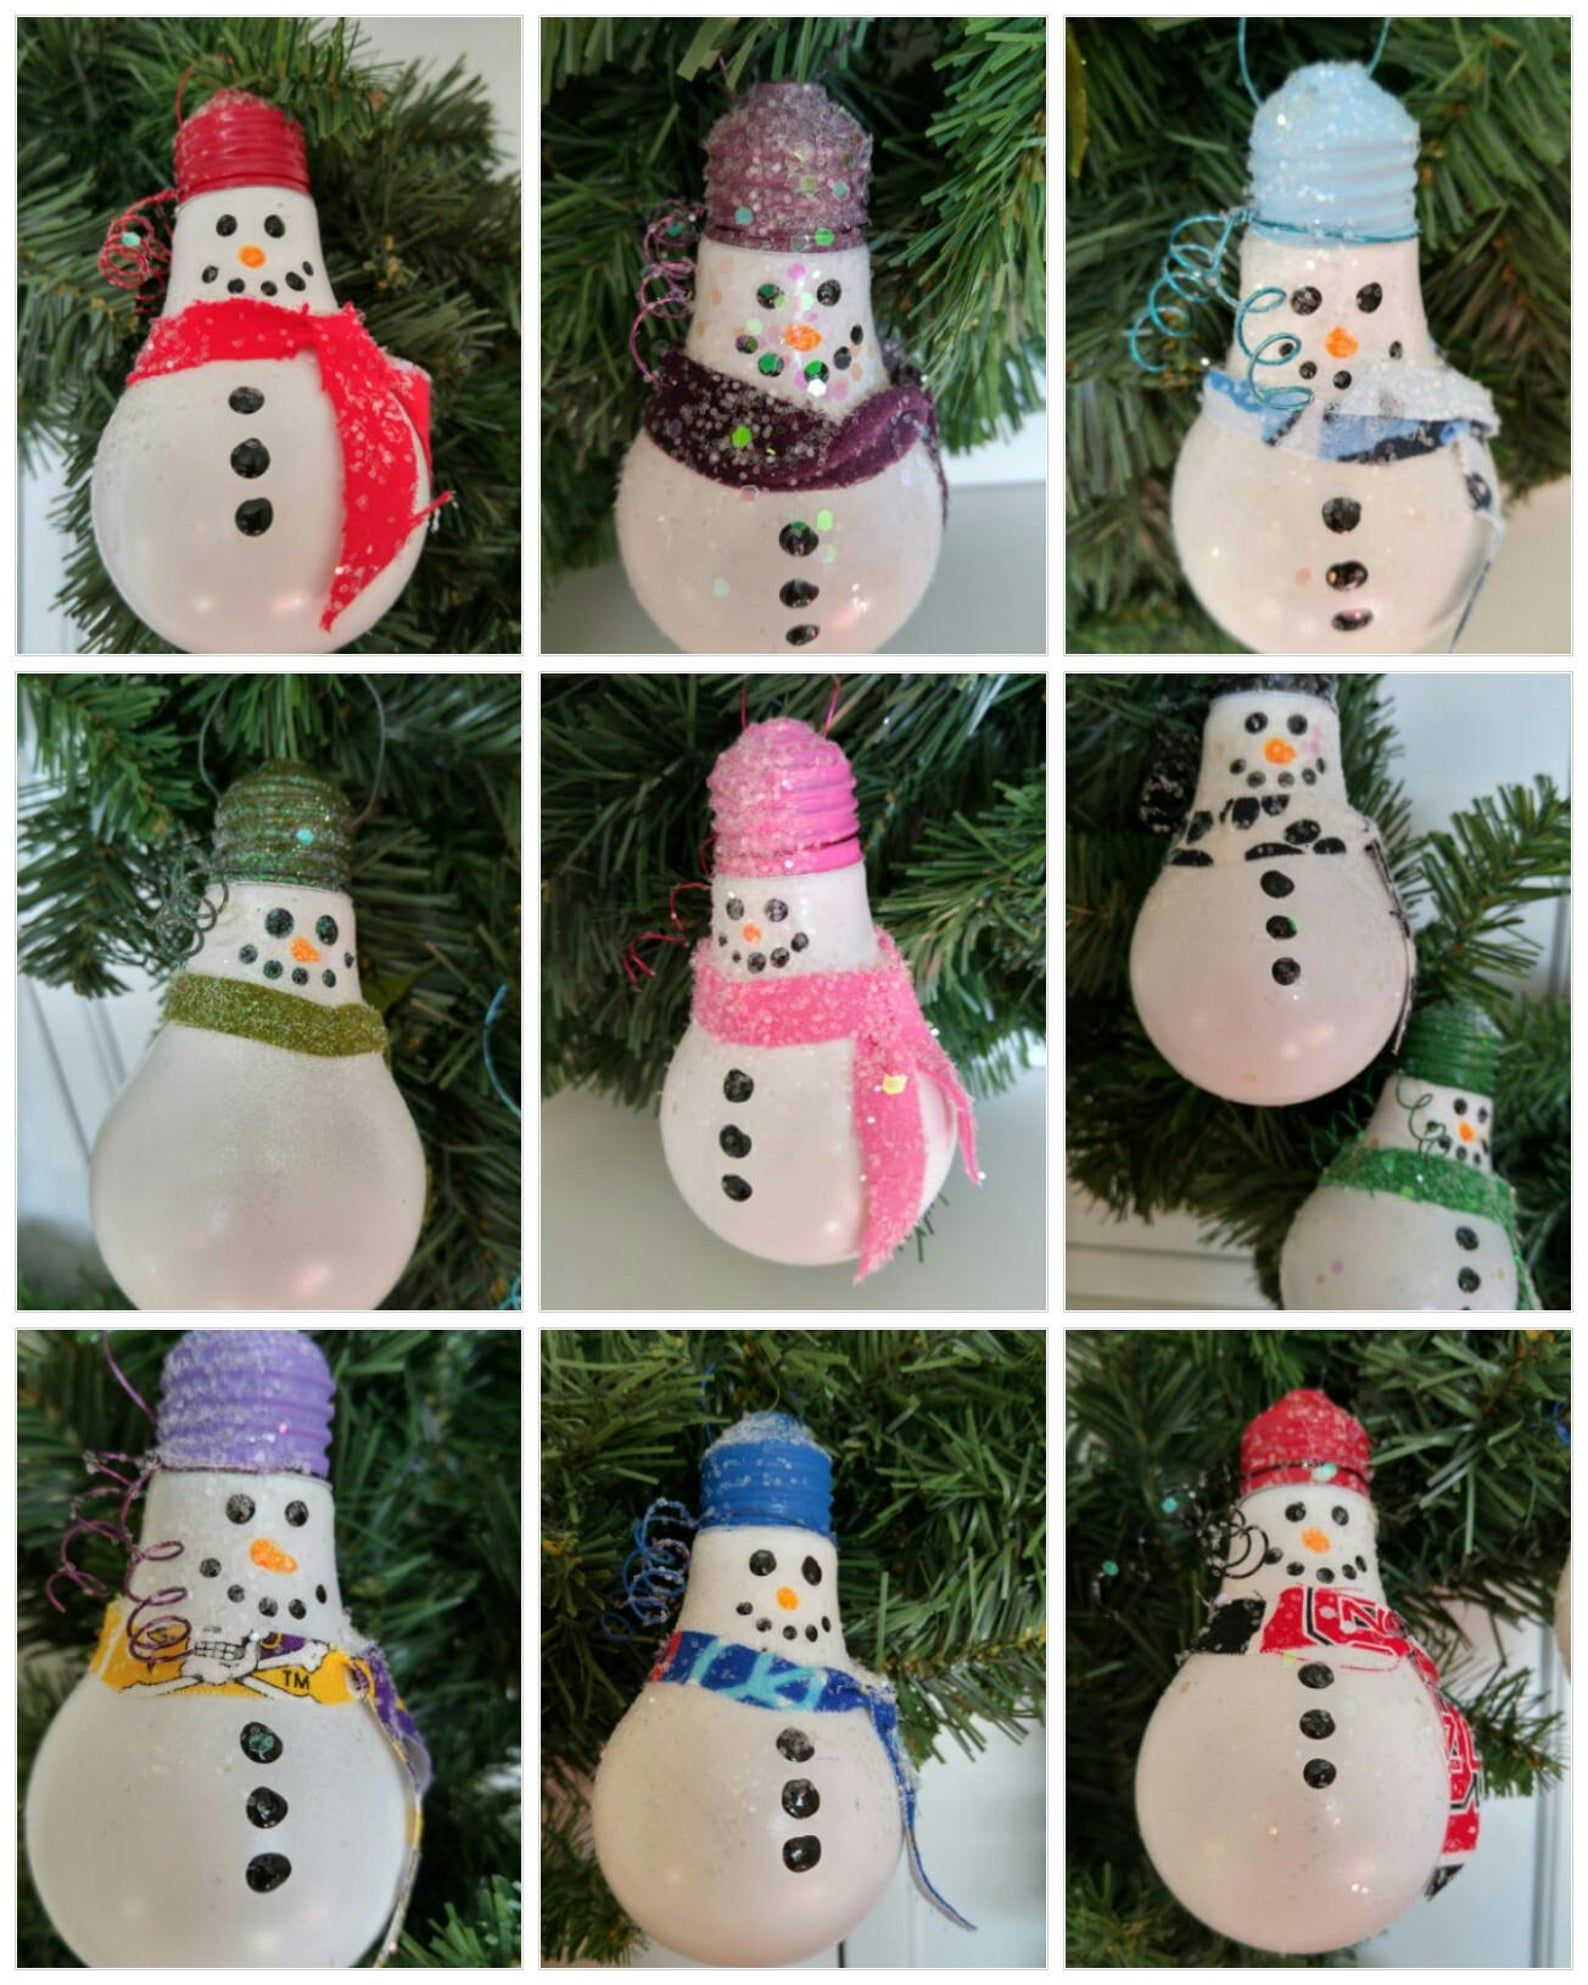 Snowman Ornament Christmas Ornament Co Worker Gift Ornament Etsy Handmade Christmas Decorations Christmas Ornament Crafts Light Bulb Ornaments